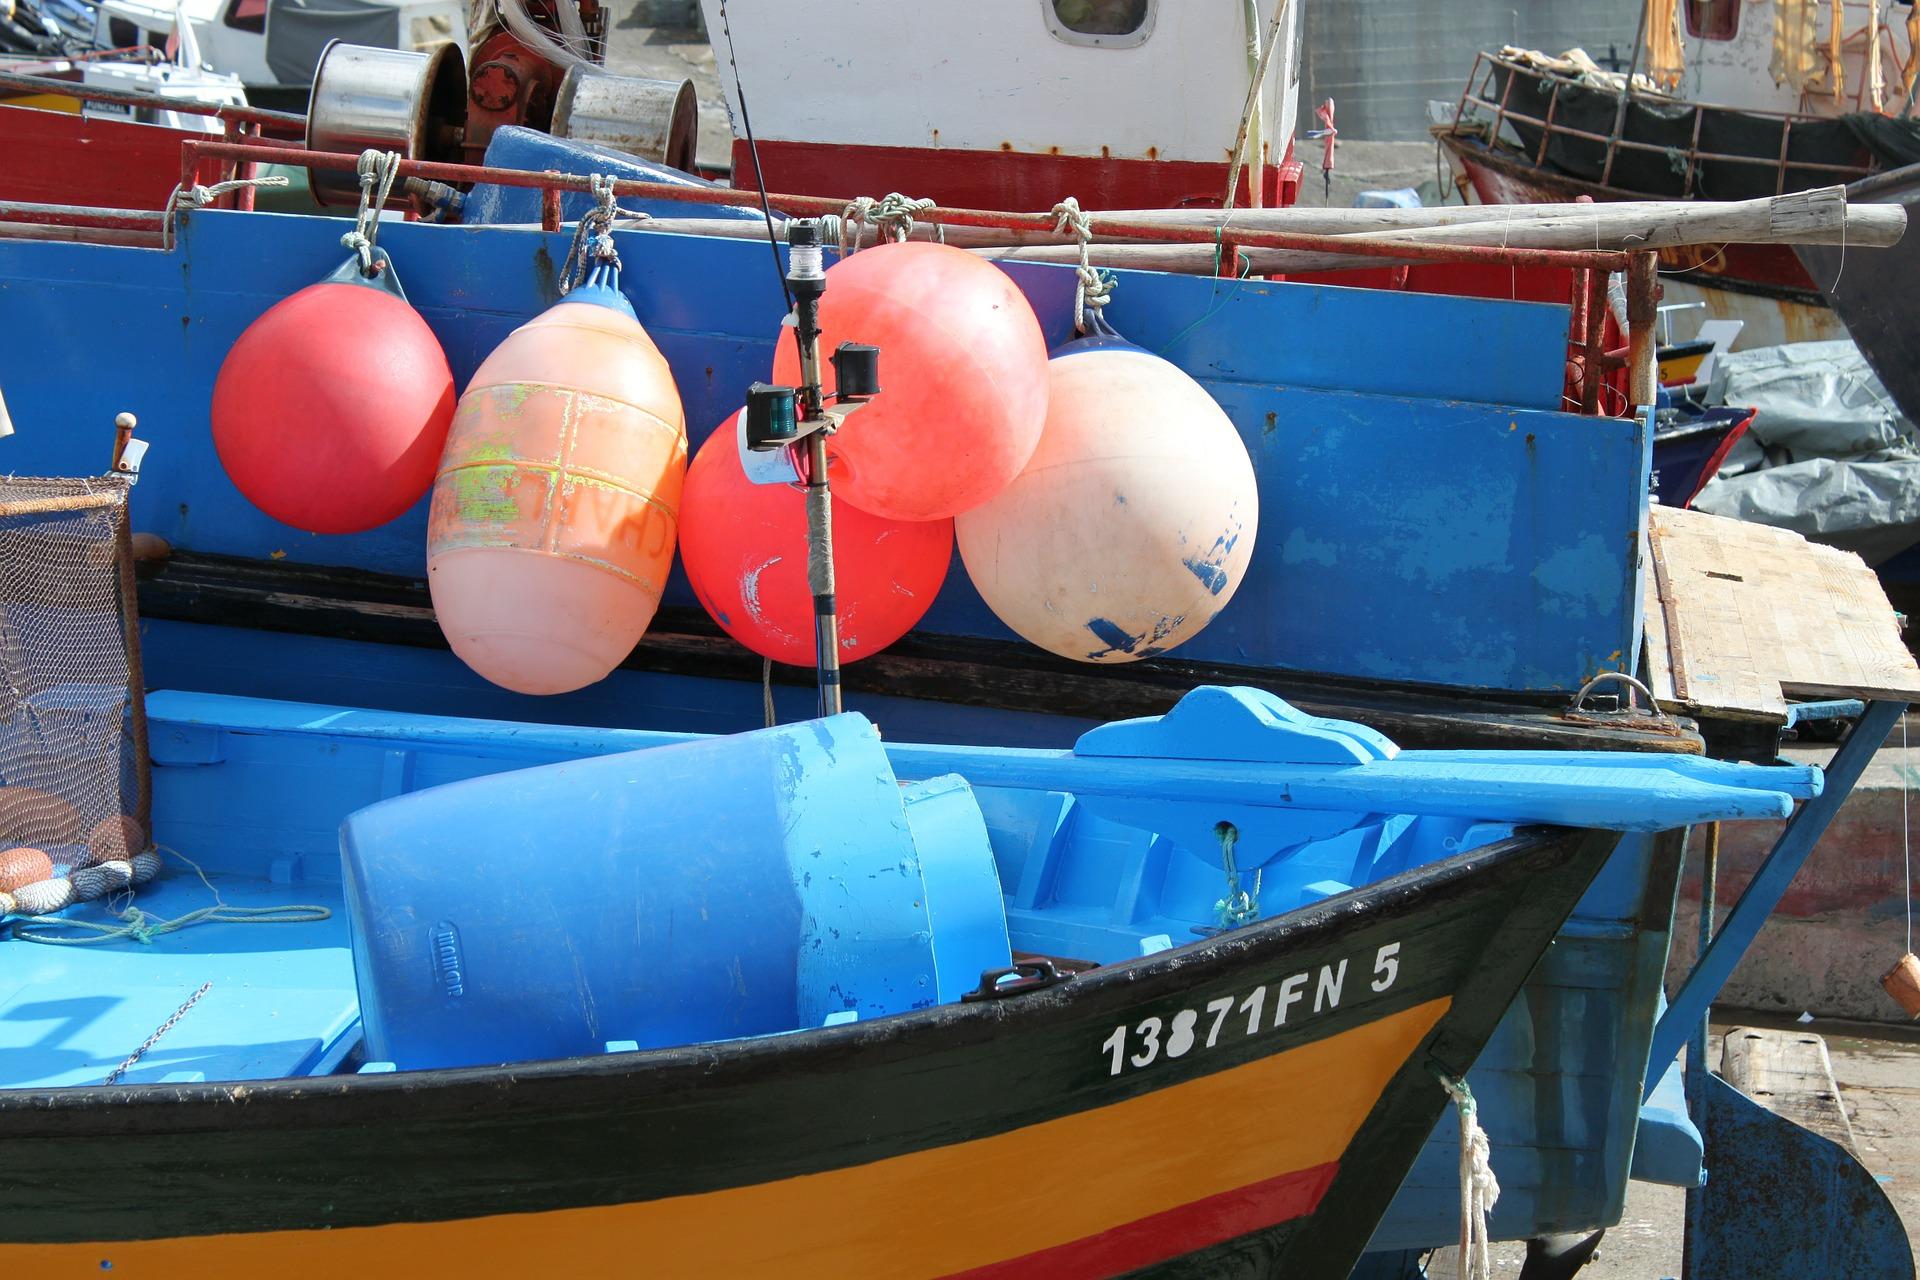 Boat, Balloon, Ride, Transport, HQ Photo